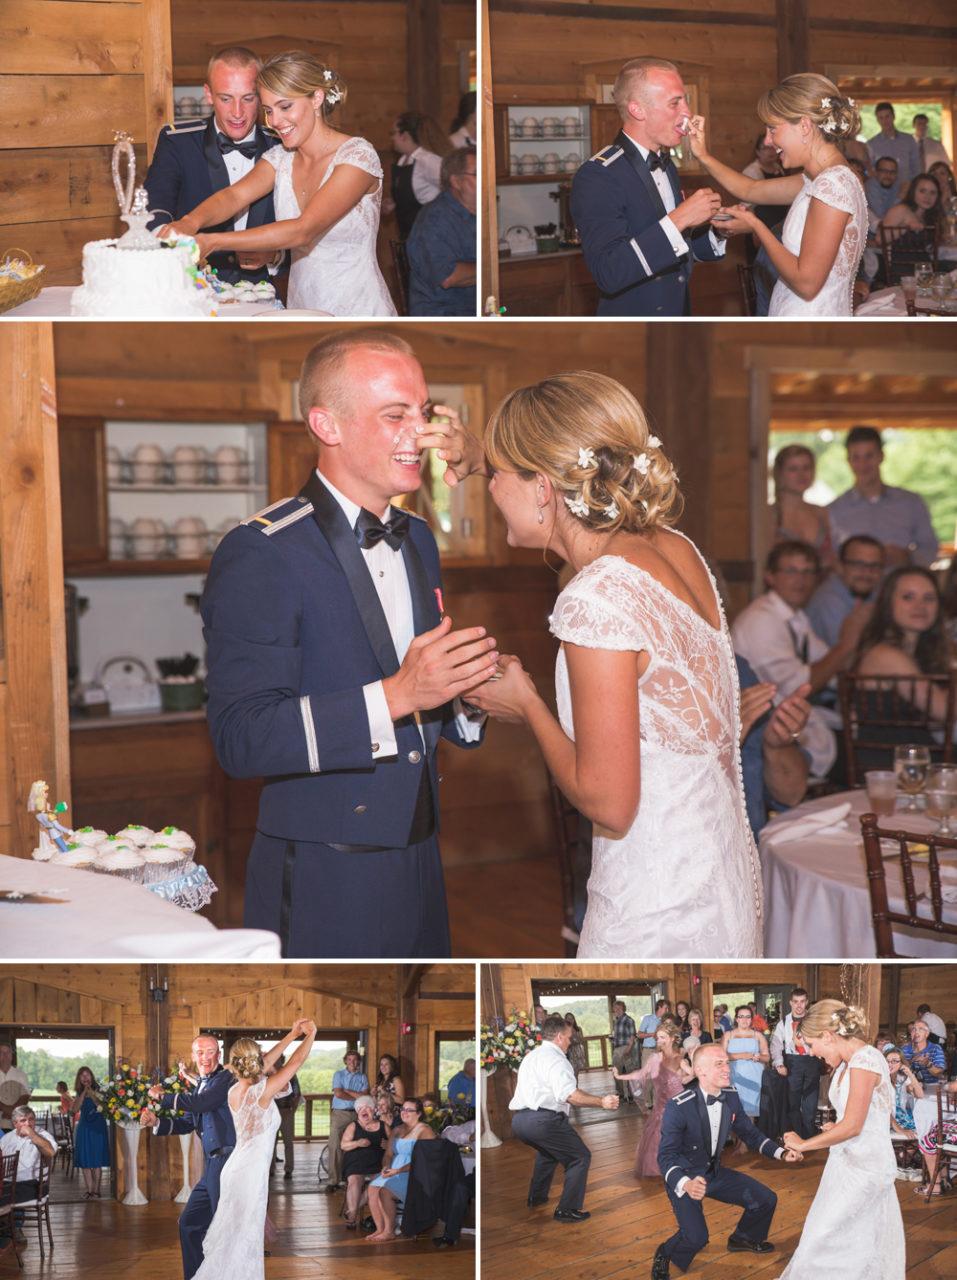 manny-pittsburgh-wedding-photographer-at-lingrow-farm-tlc-four-weddings-wedding-with-a-volcano-13